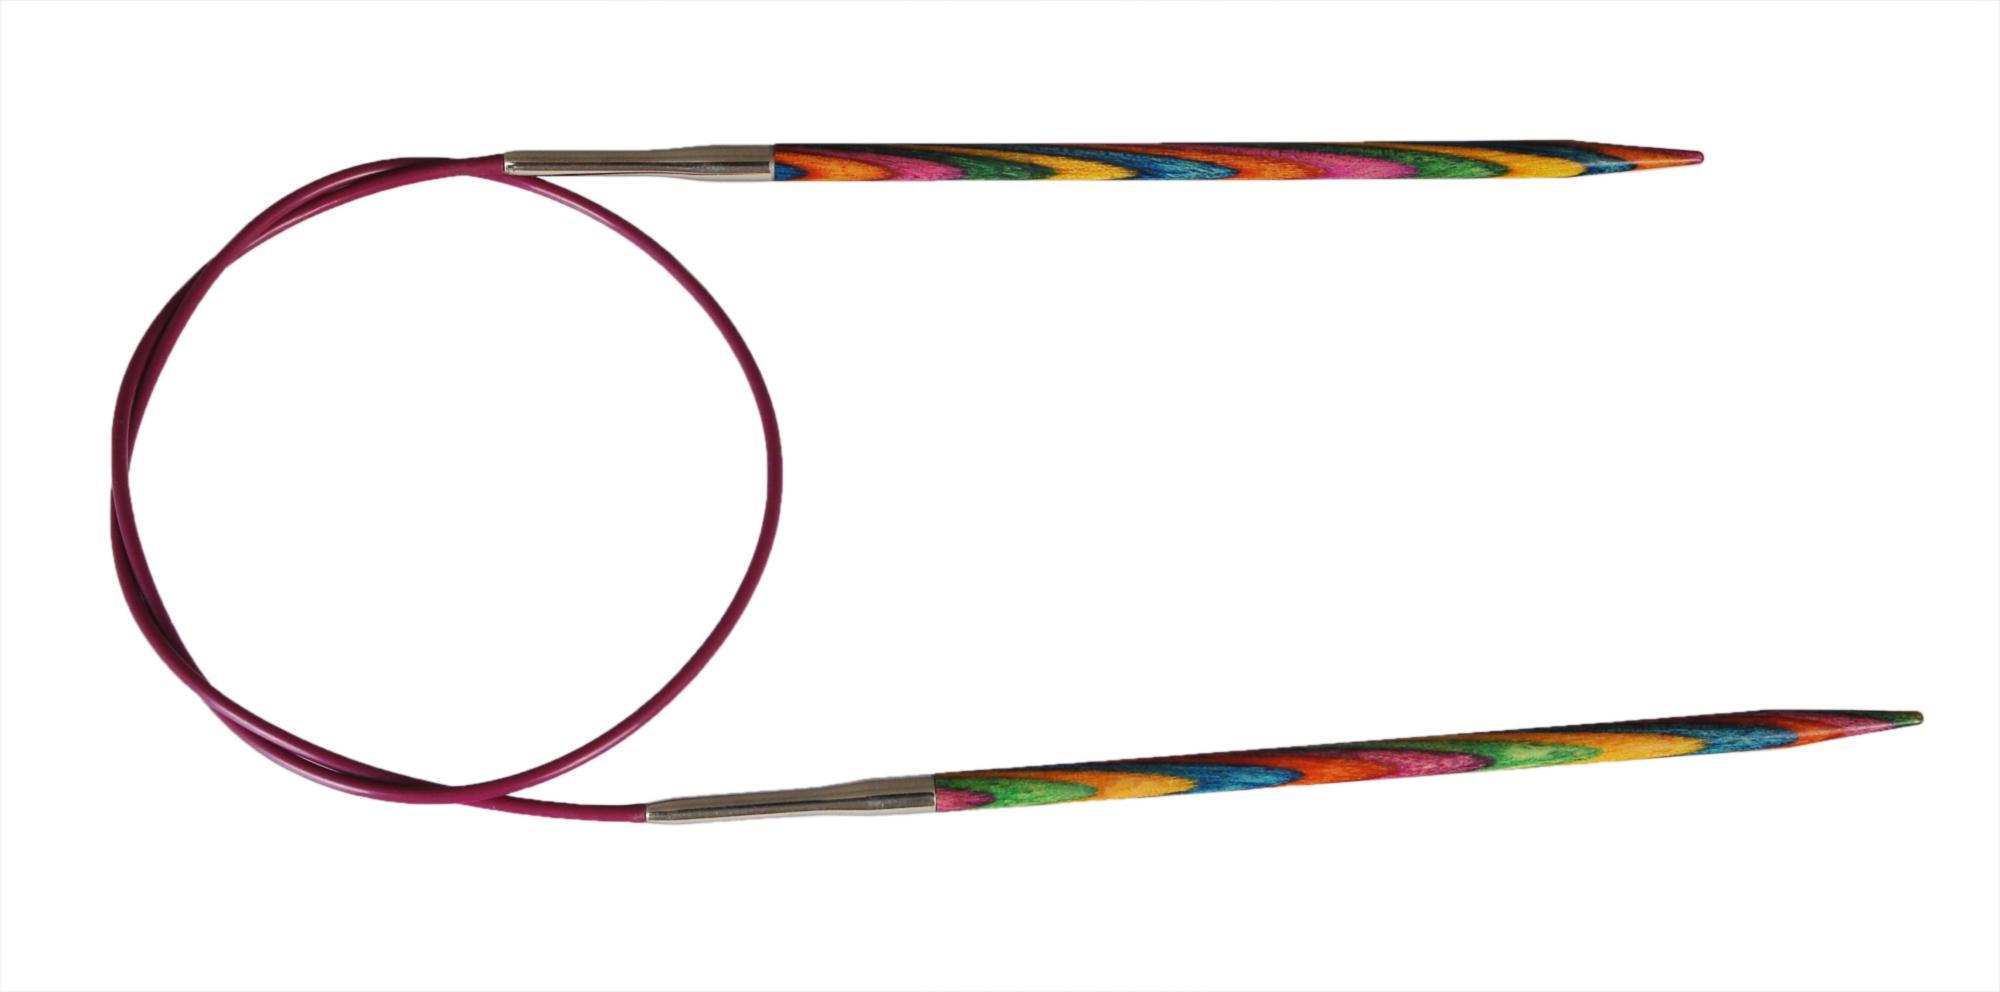 Спицы круговые 120 см Symfonie Wood KnitPro, 21369, 5.00 мм